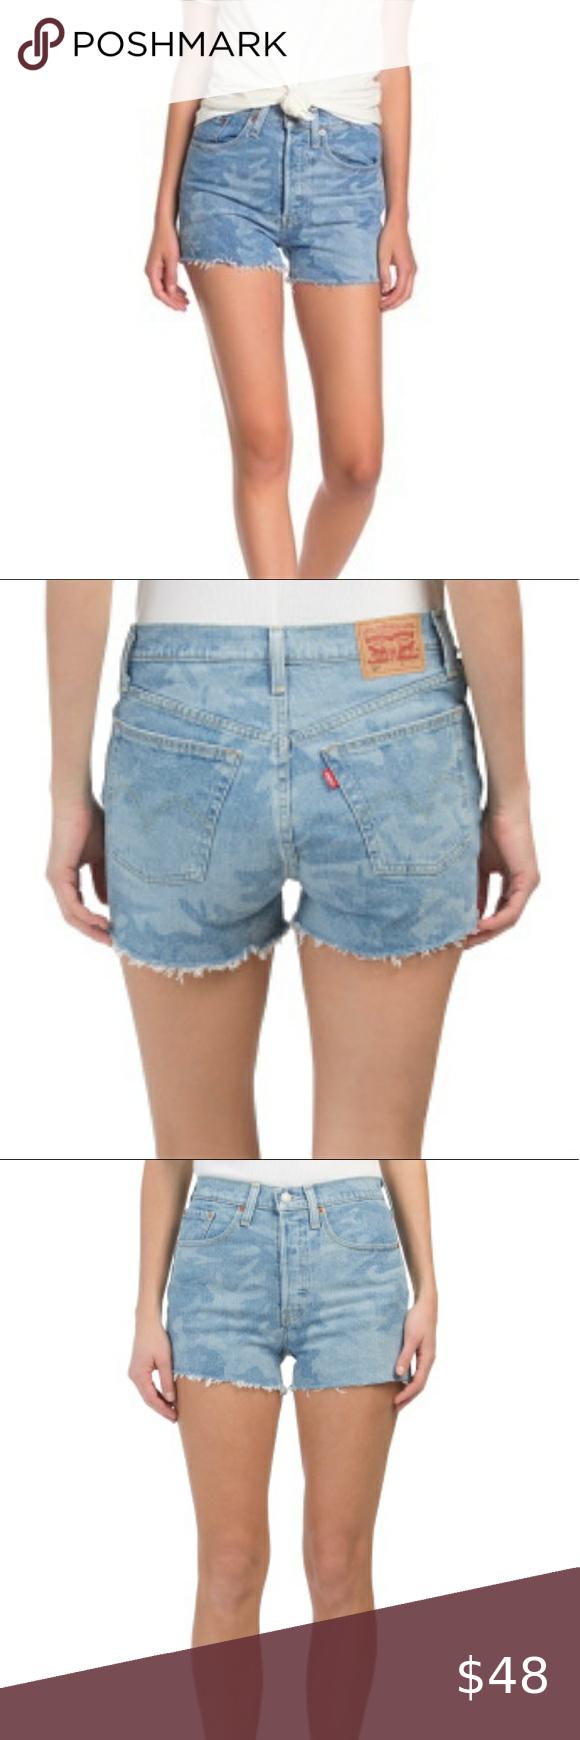 Levi S 501 High Rise Camo Cutoff Jean Shorts Cutoff Jean Shorts Jean Shorts Levi [ 1740 x 580 Pixel ]